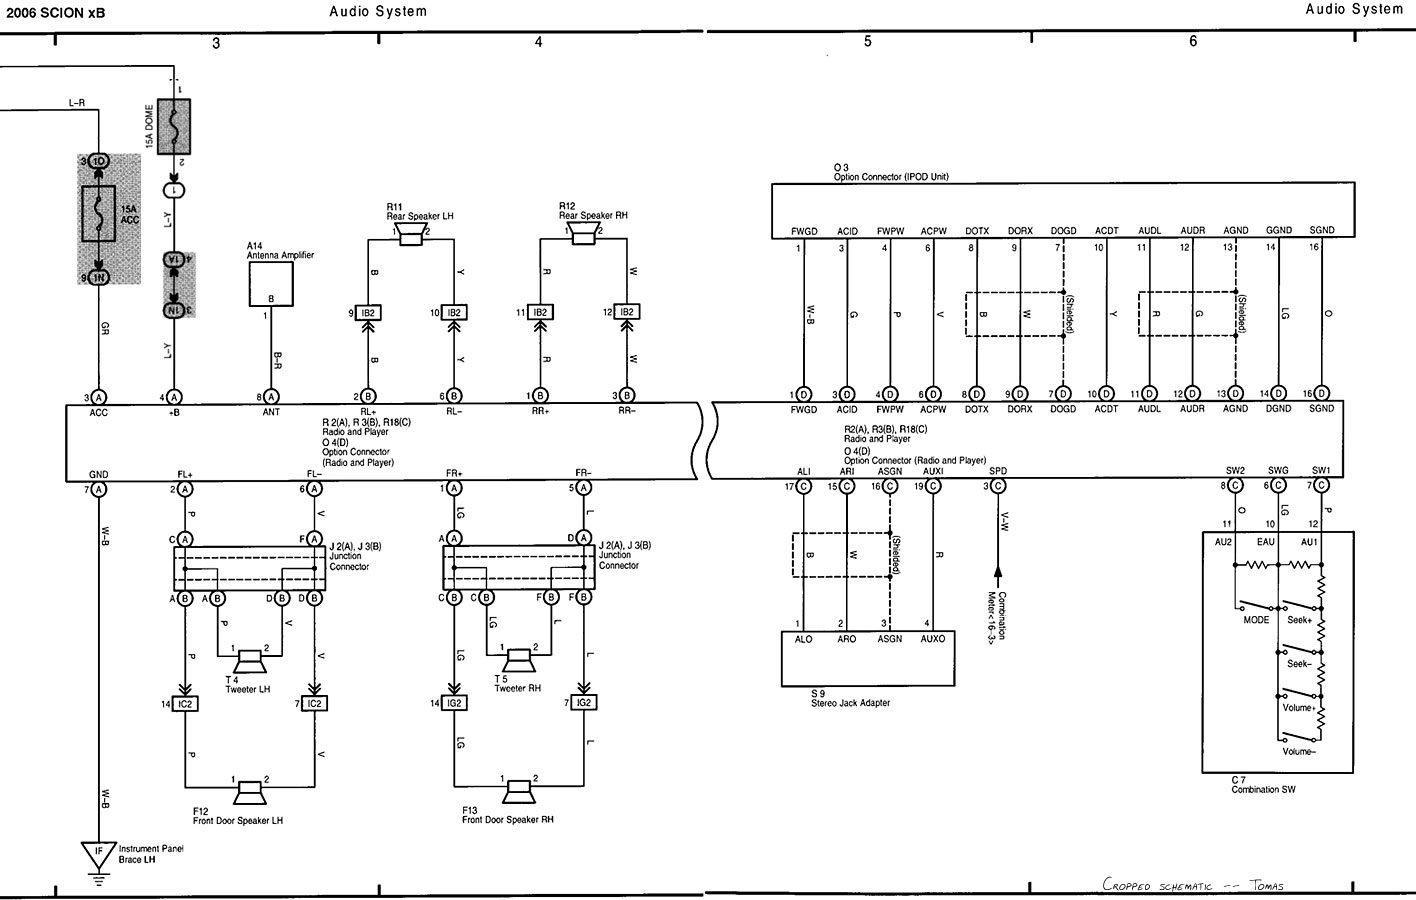 Scion Tc Headlight Wiring Harness Best Secret Diagram Connector 2011 Diagrams Rh 41 Shareplm De 2006 Headlights